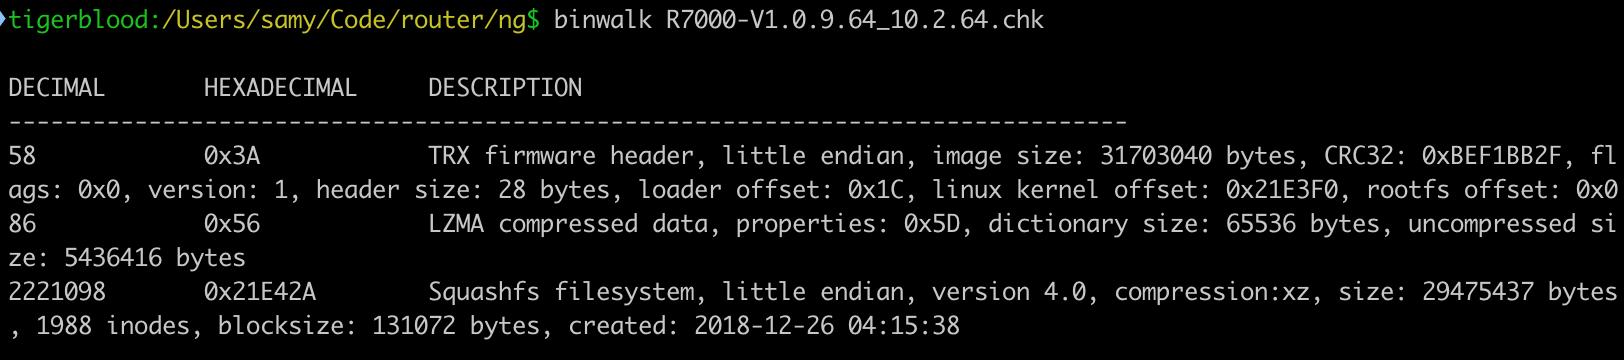 binwalk R7000-V1.0.9.64_10.2.64.chk